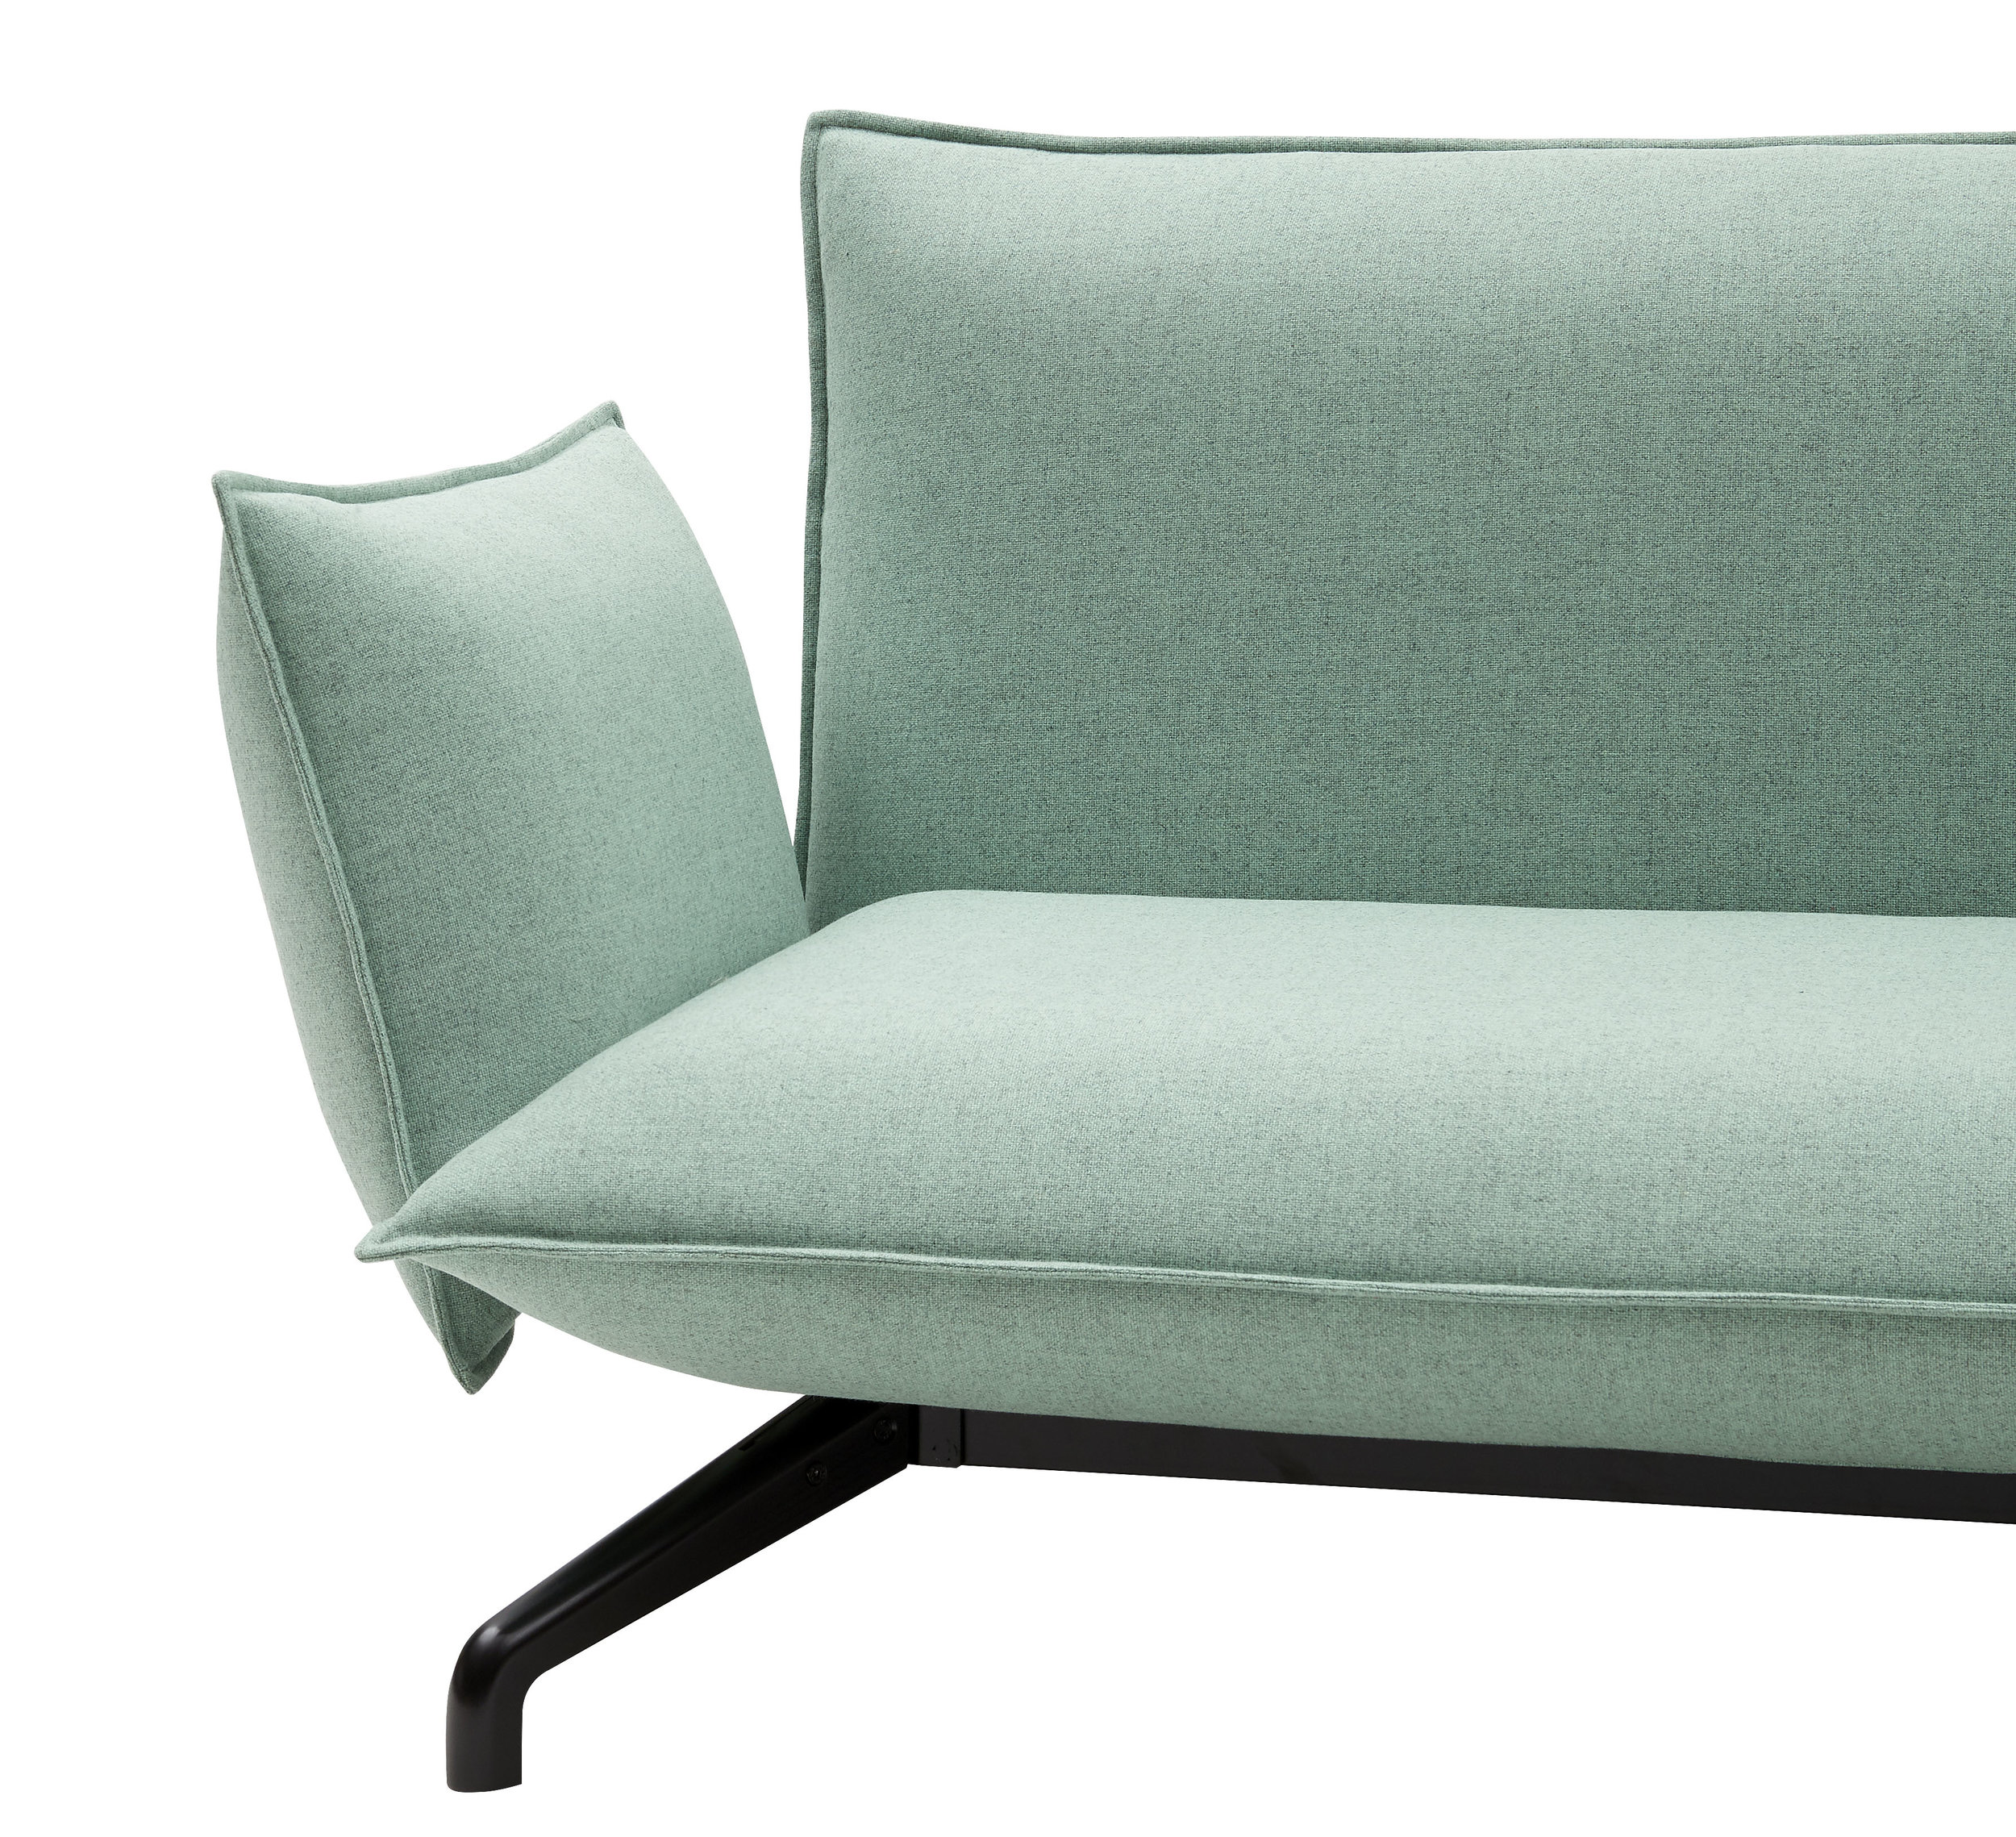 Johannes-Steinbauer-Design-Invert-Sofa-Softline-8.jpg